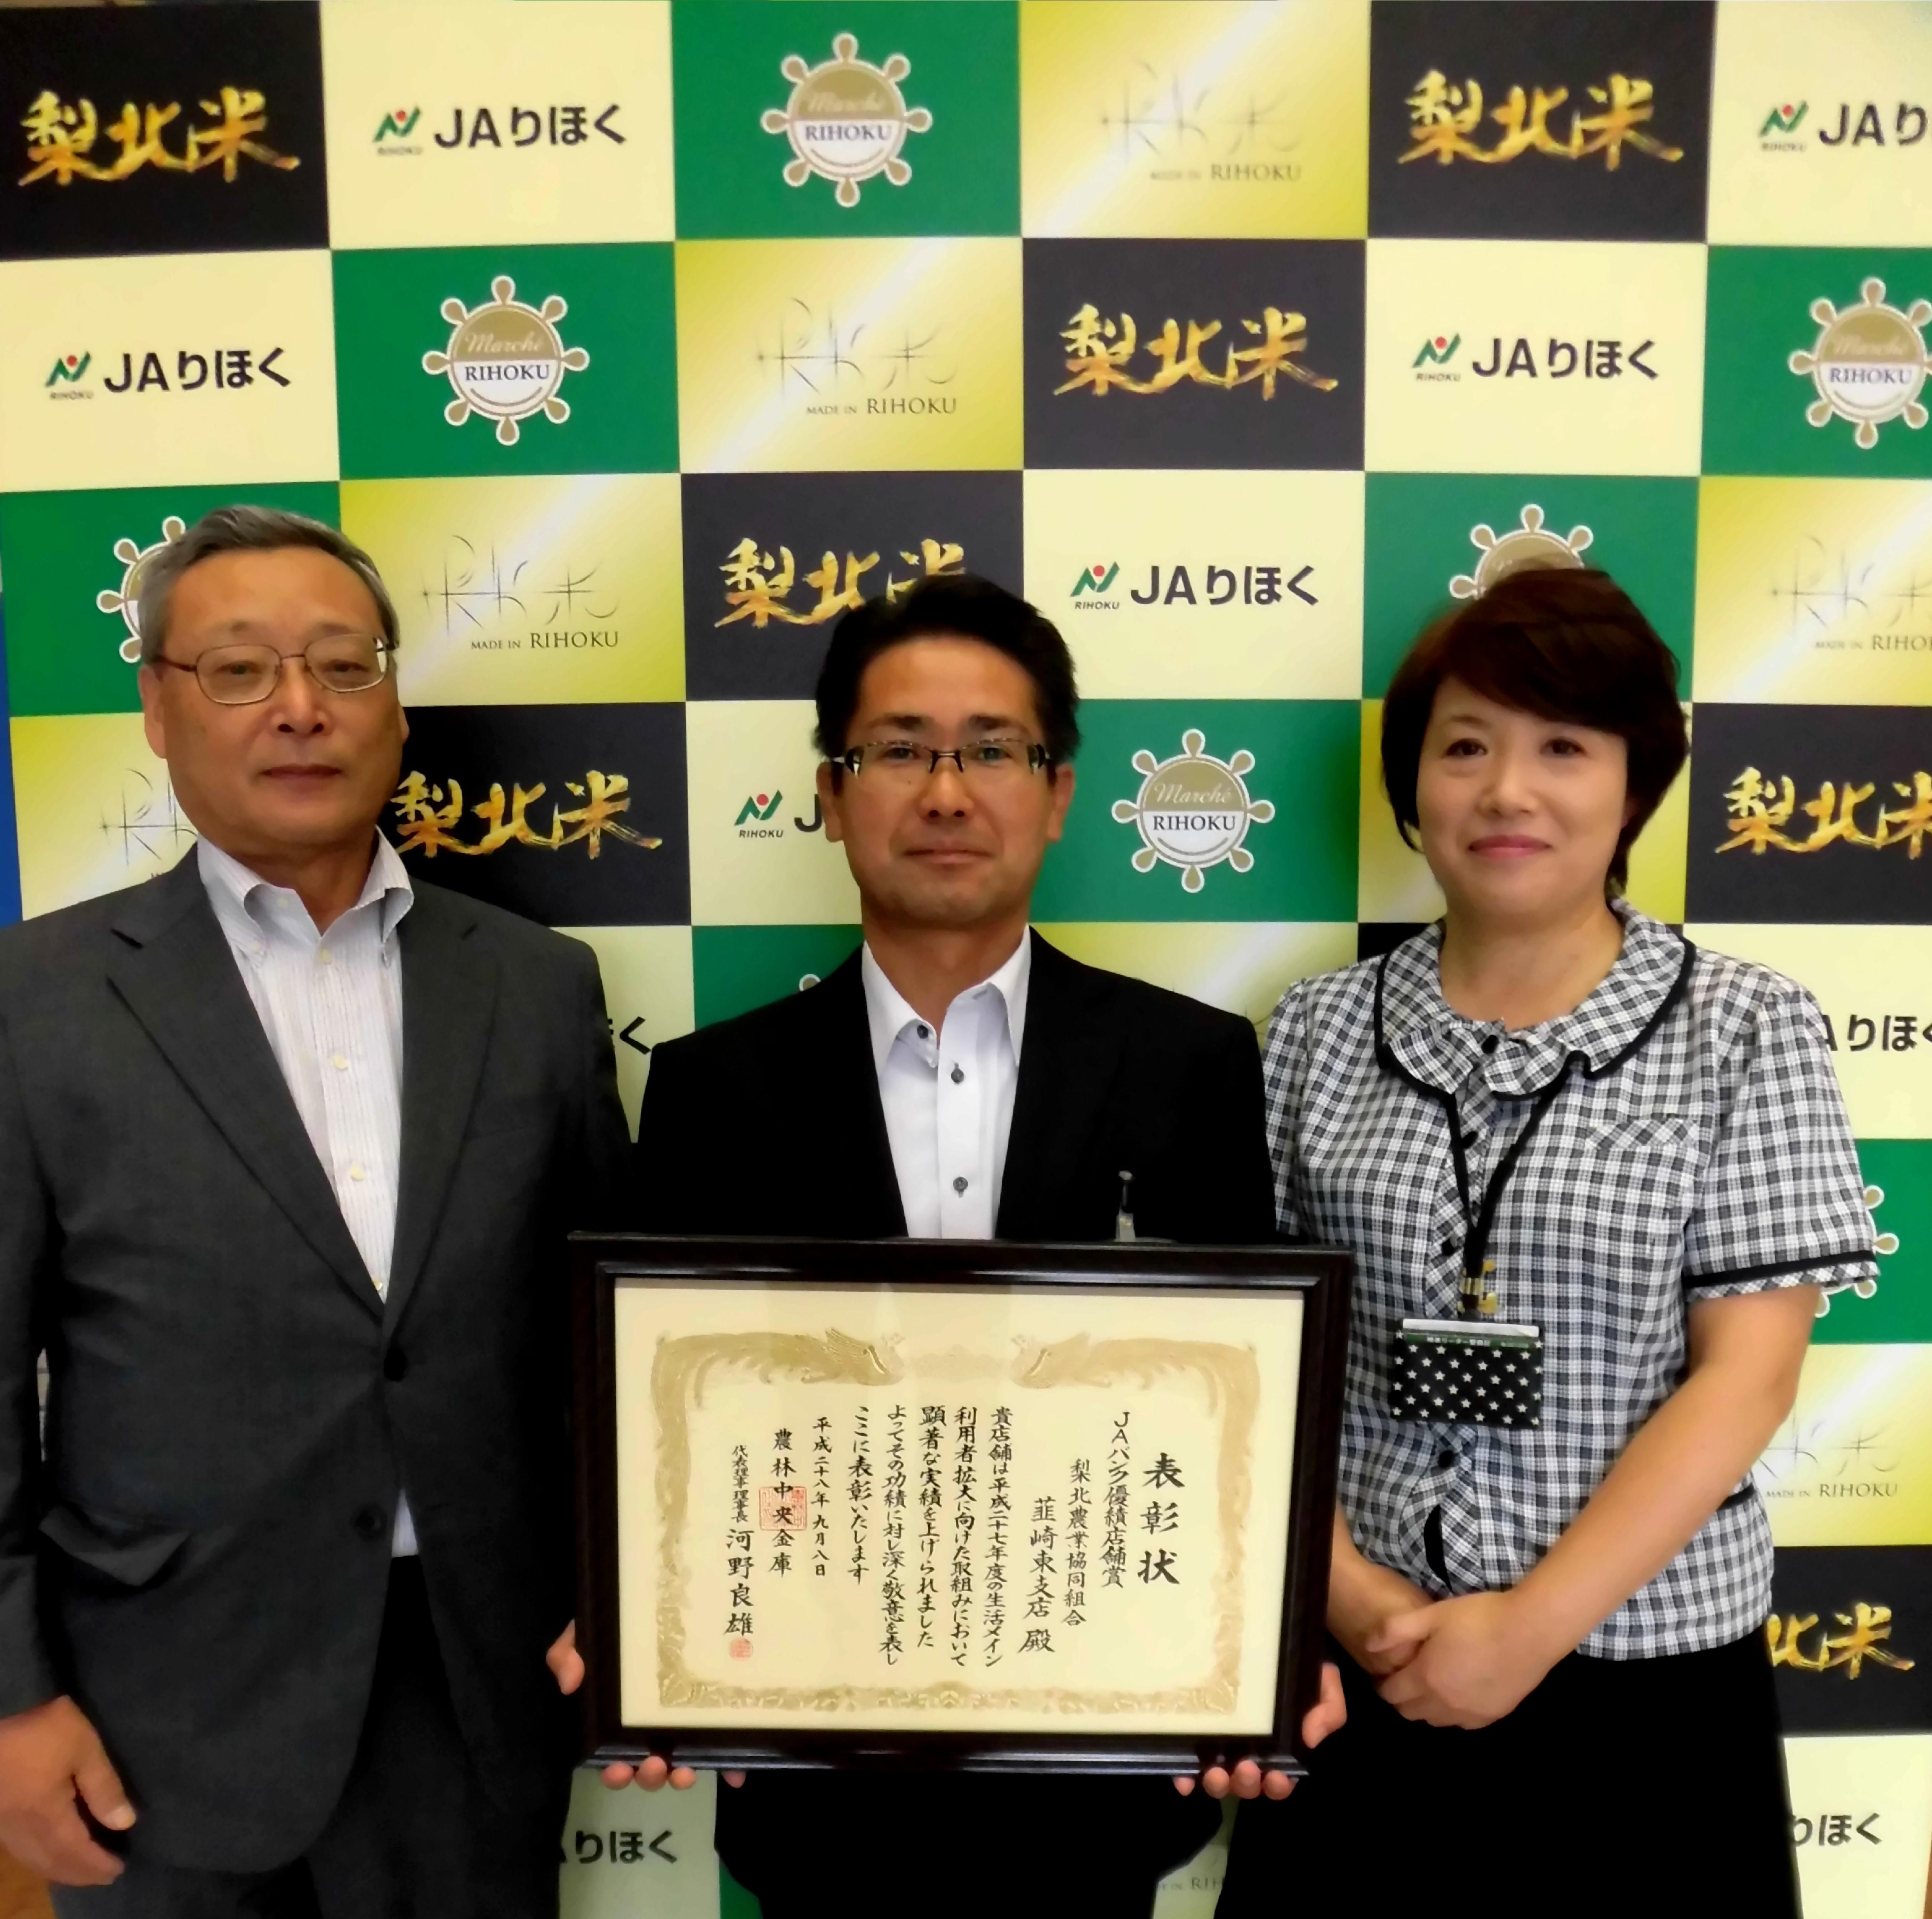 平成27年度JAバンク優績表彰